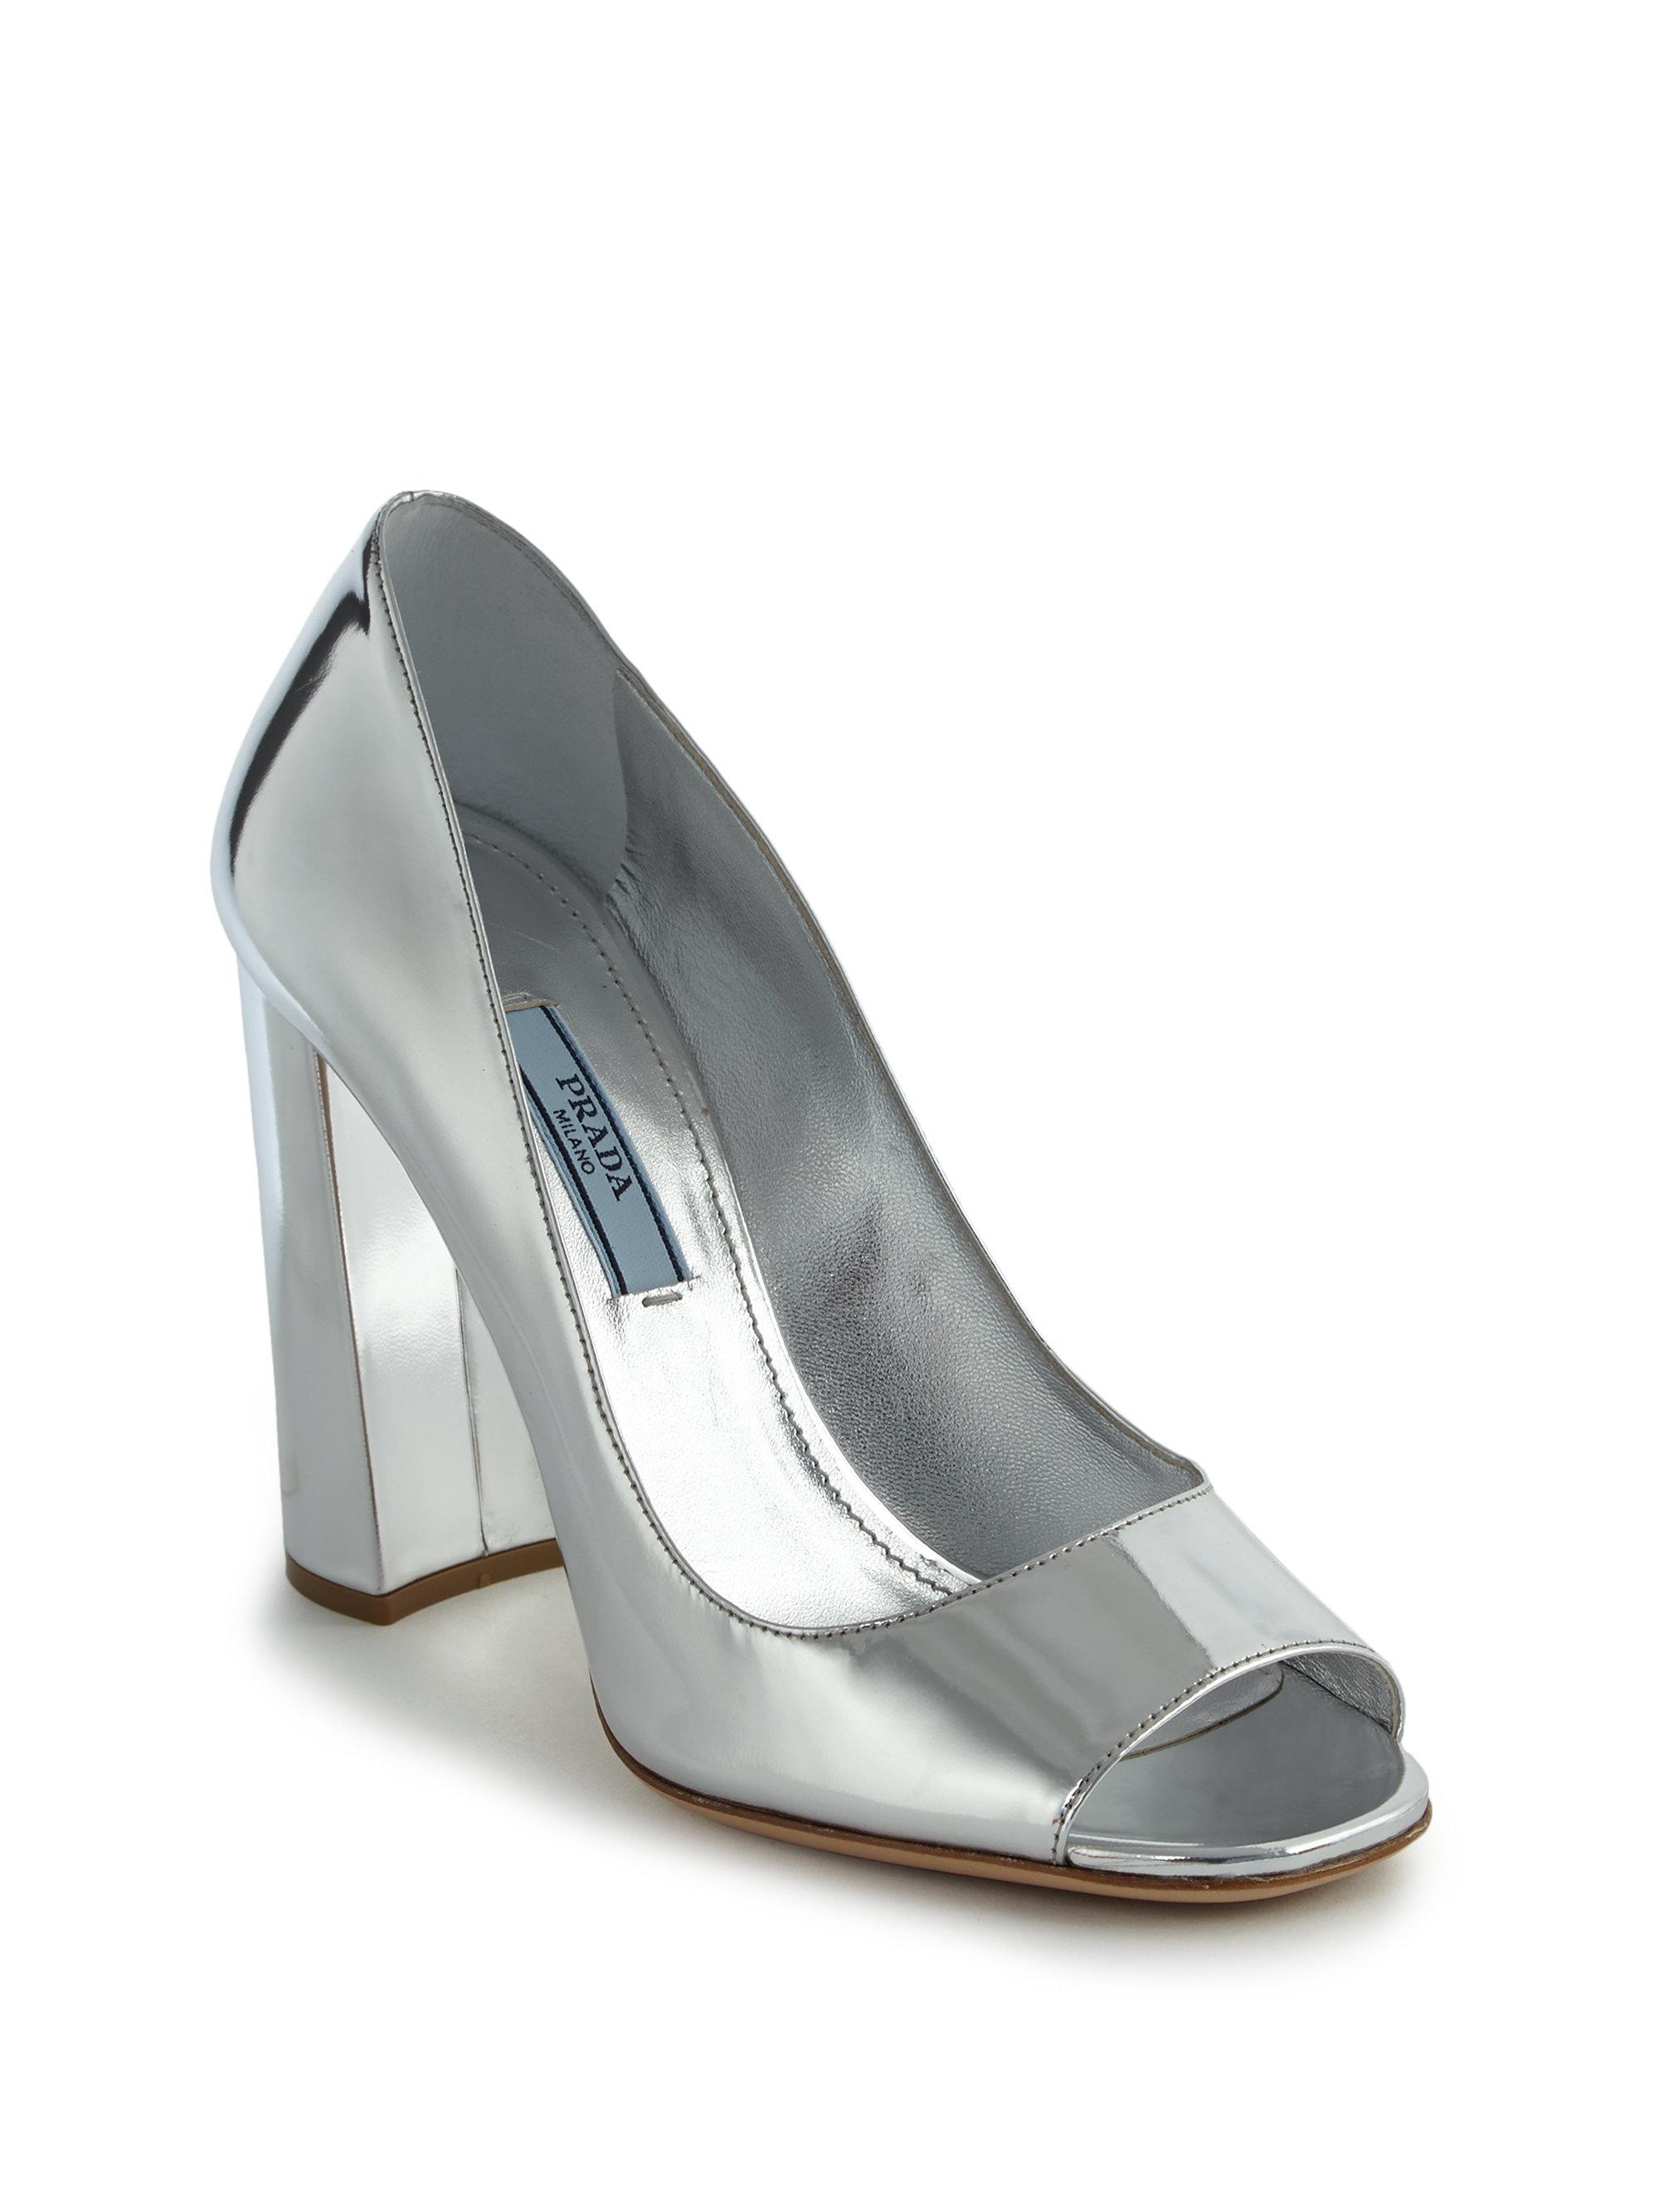 3ccb895bade9 Lyst - Prada Metallic Leather Peep-toe Pumps in Metallic